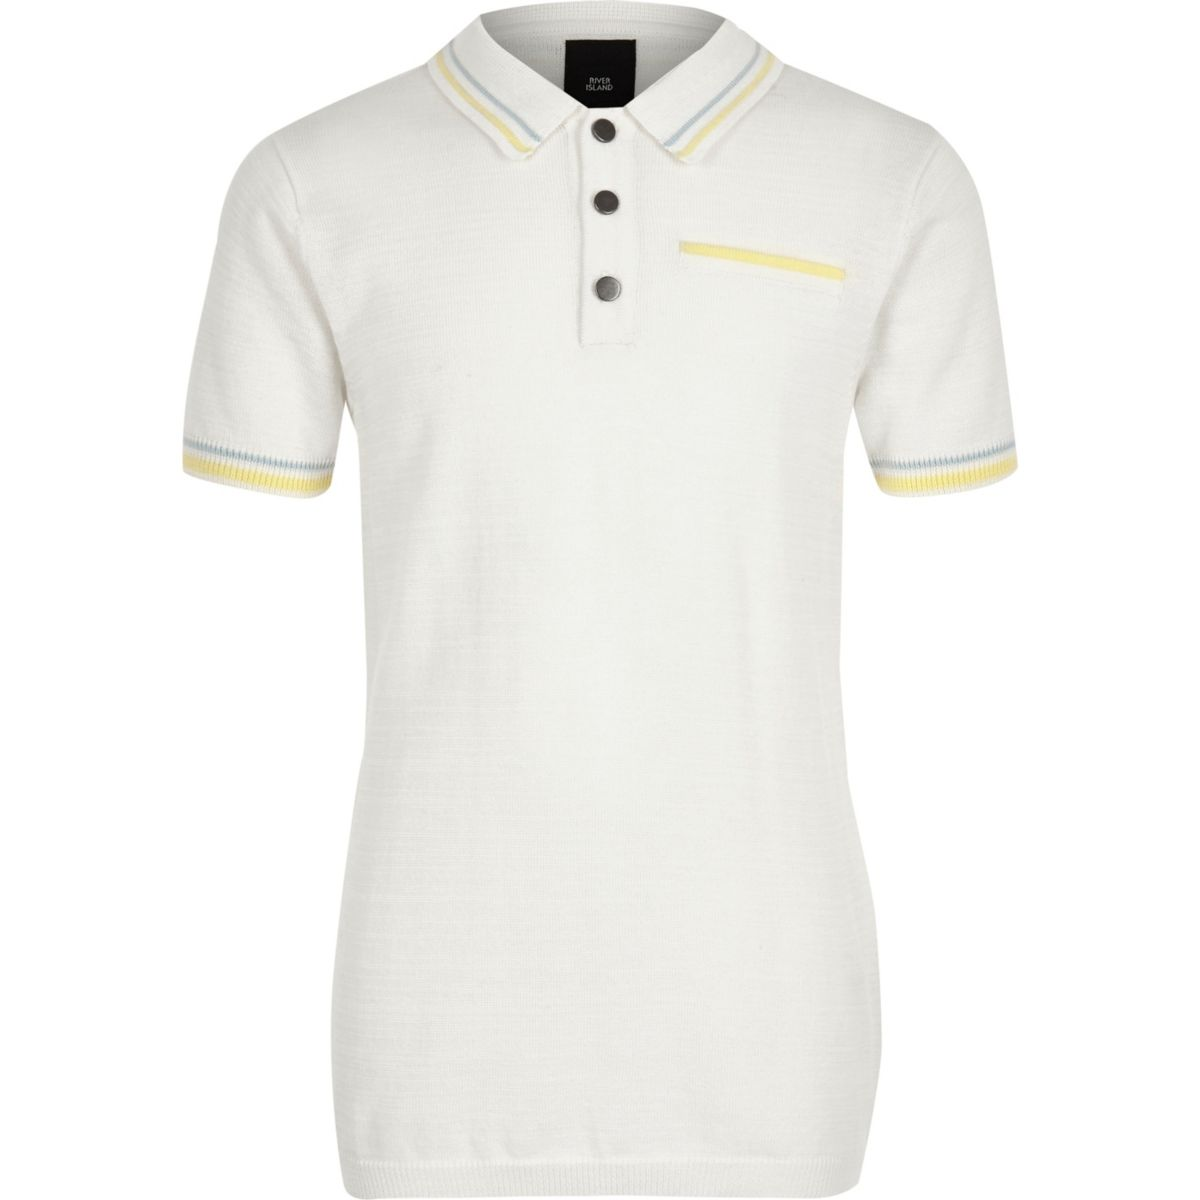 Boys white tipped smart polo shirt